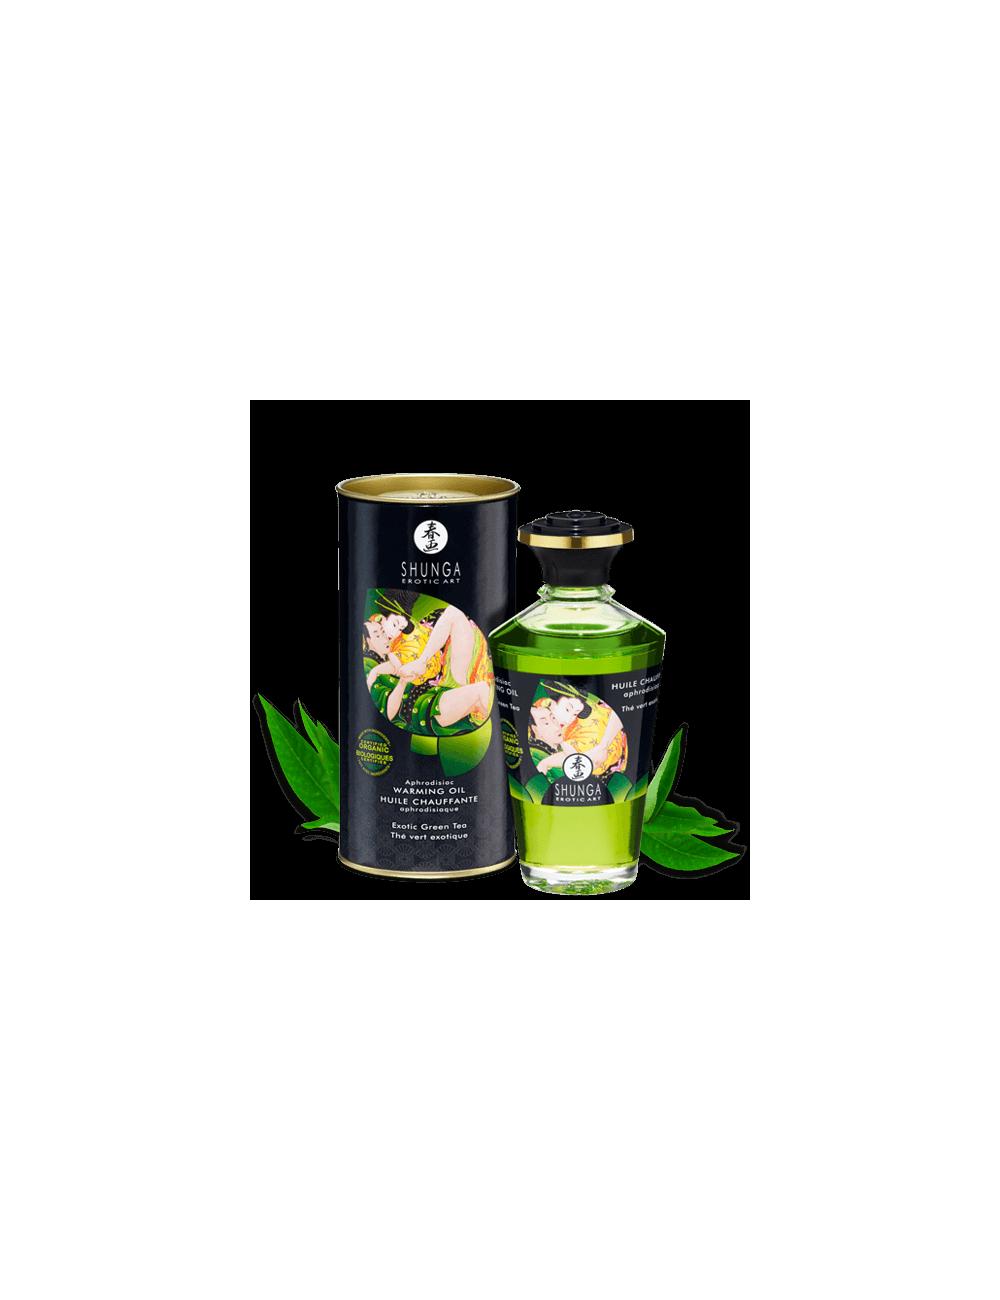 Huile aphrodisiaque organique - Thé vert exotique - Huiles de massage - Shunga